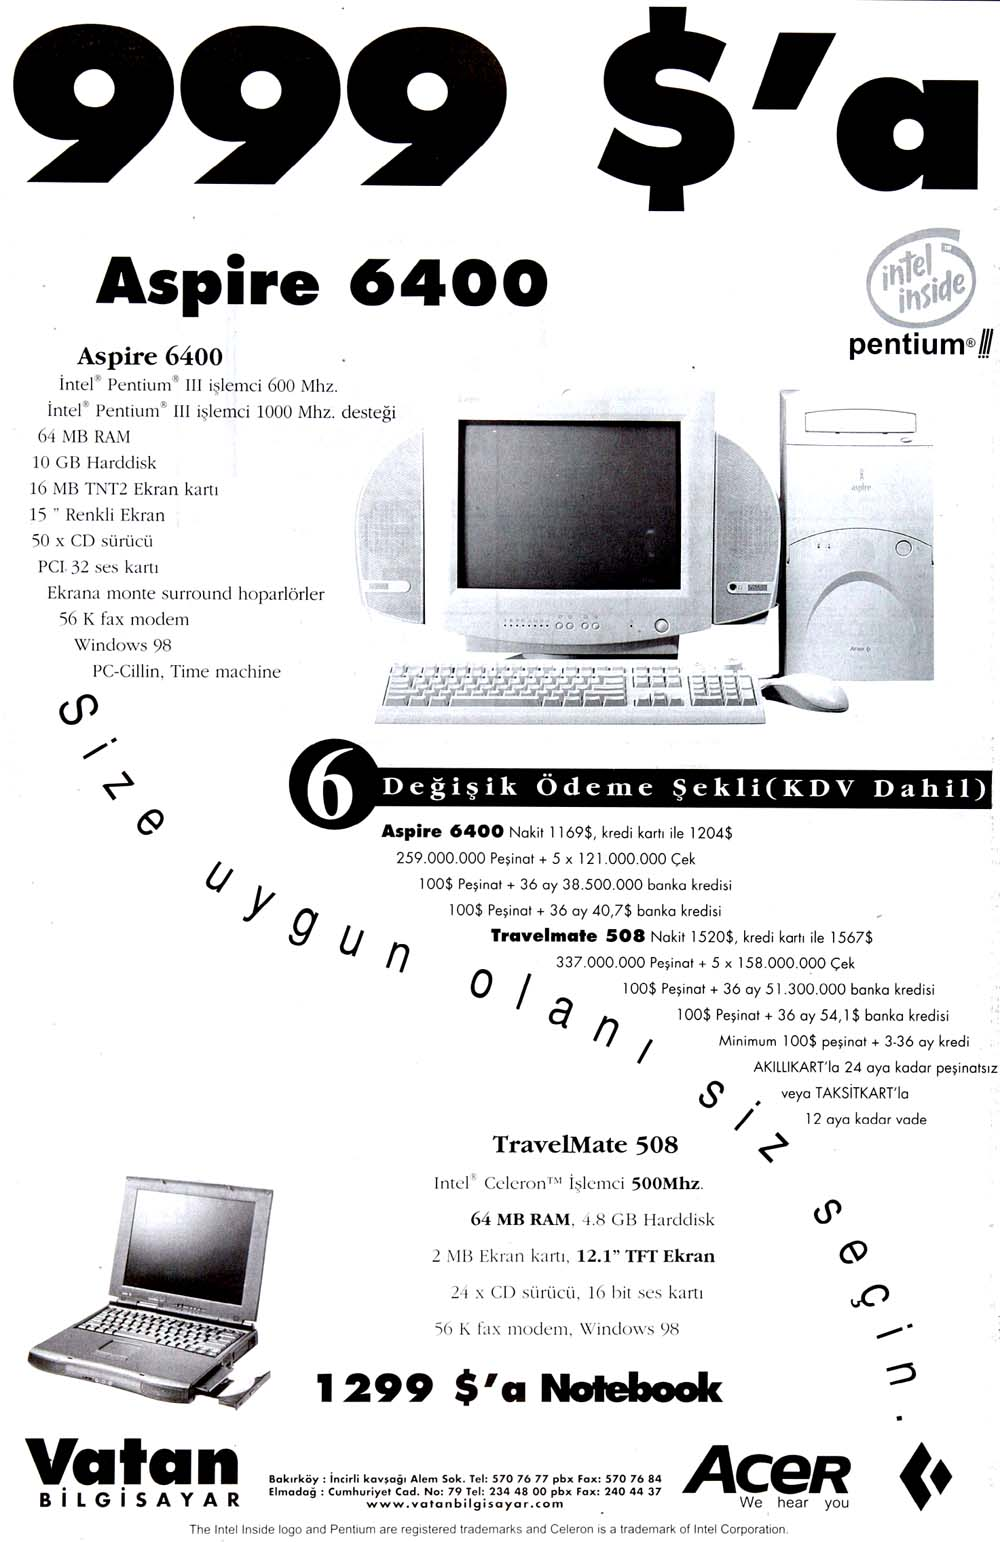 Aspire 6400